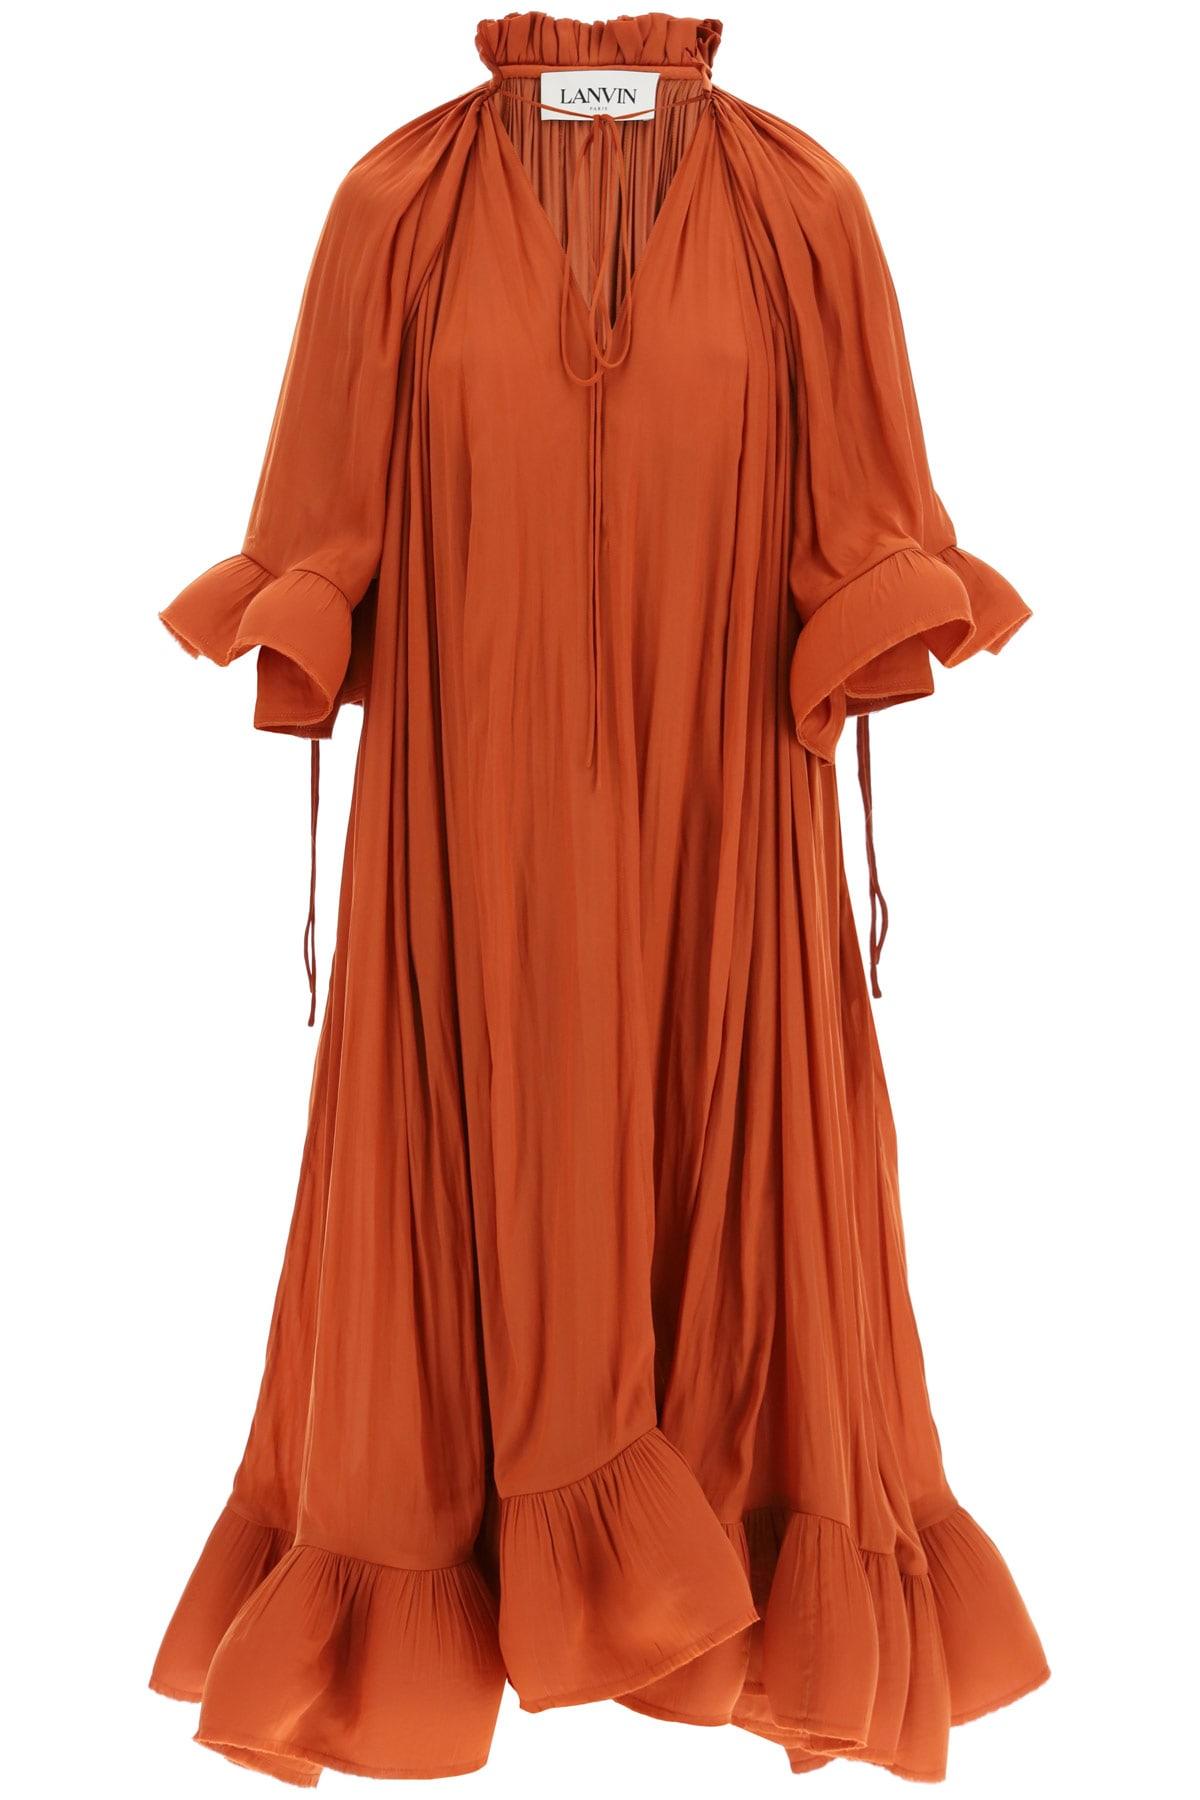 Lanvin LONG DRESS WITH RUFFLES